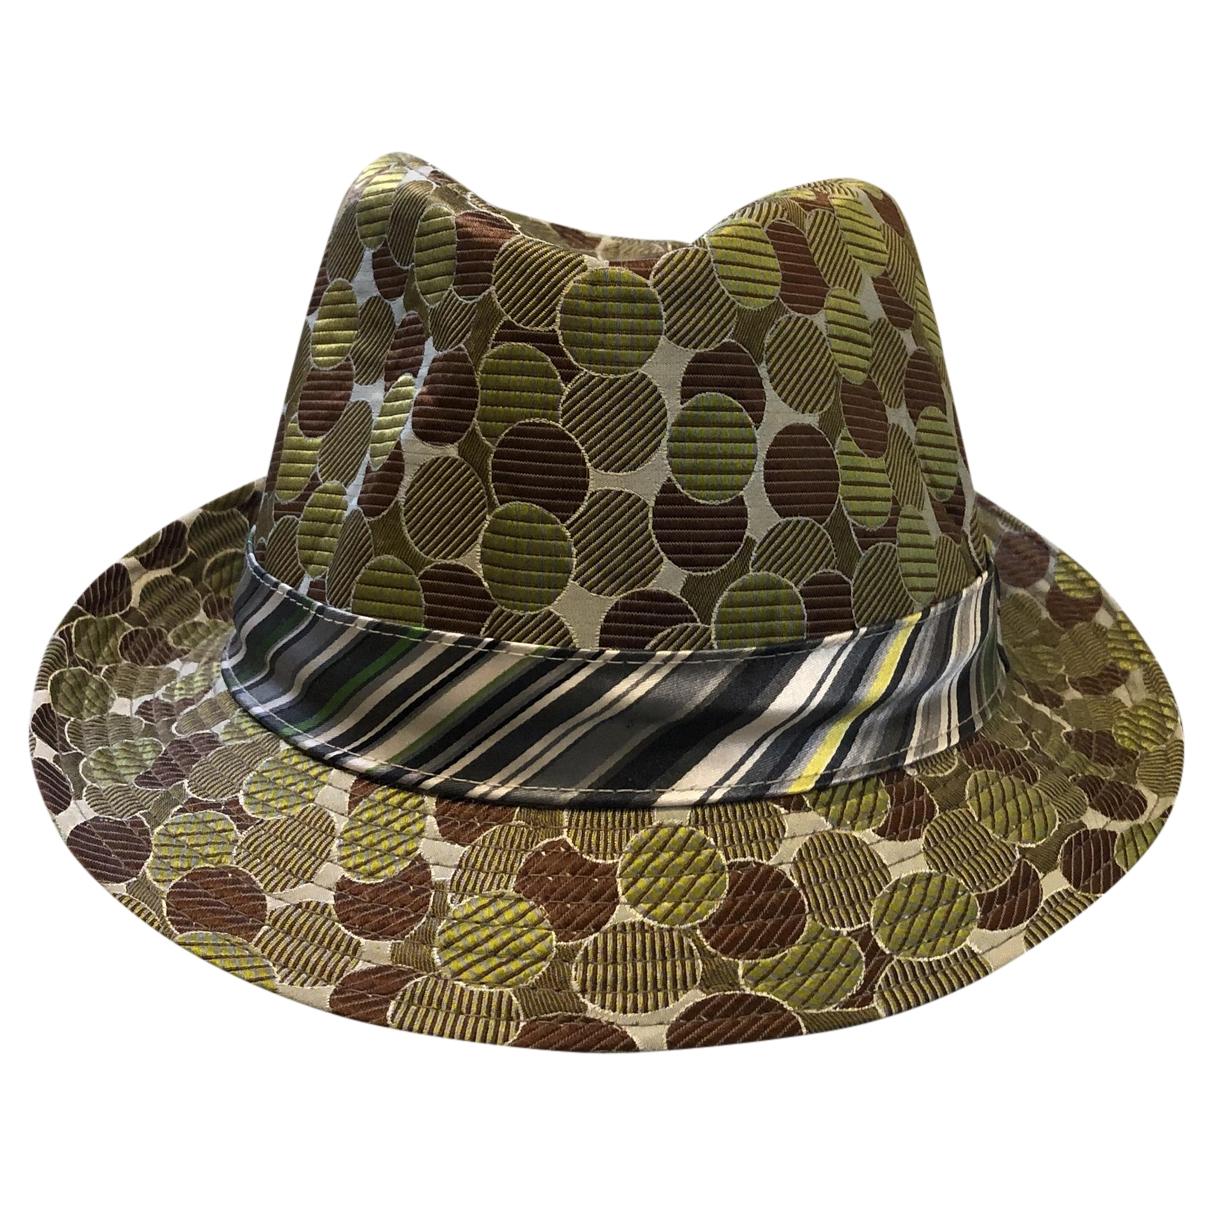 Paul Smith \N Green hat for Women M International